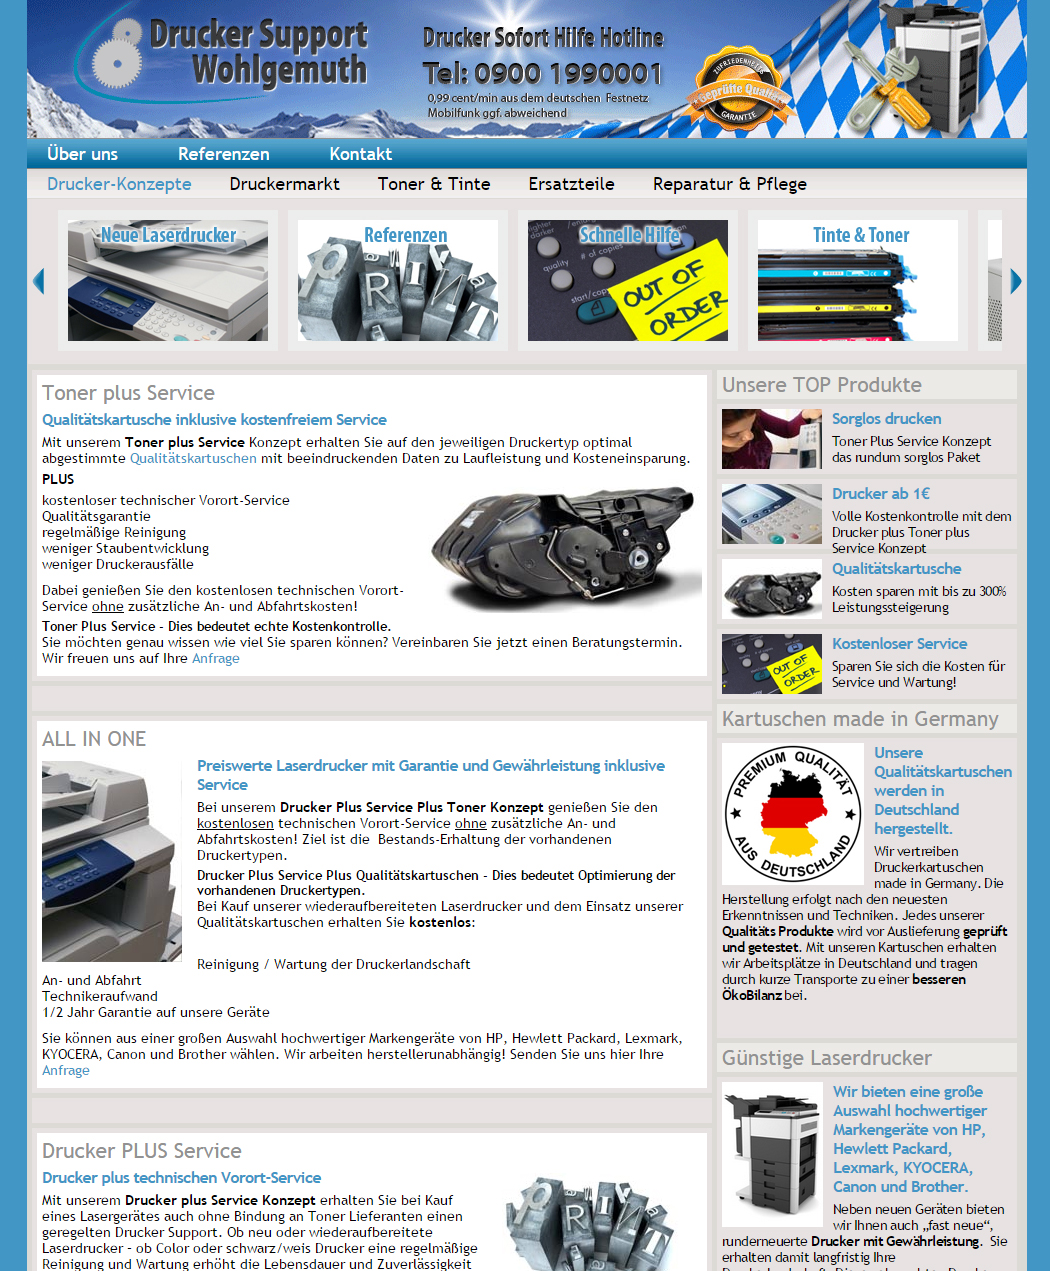 Drucker Support Website2.jpg